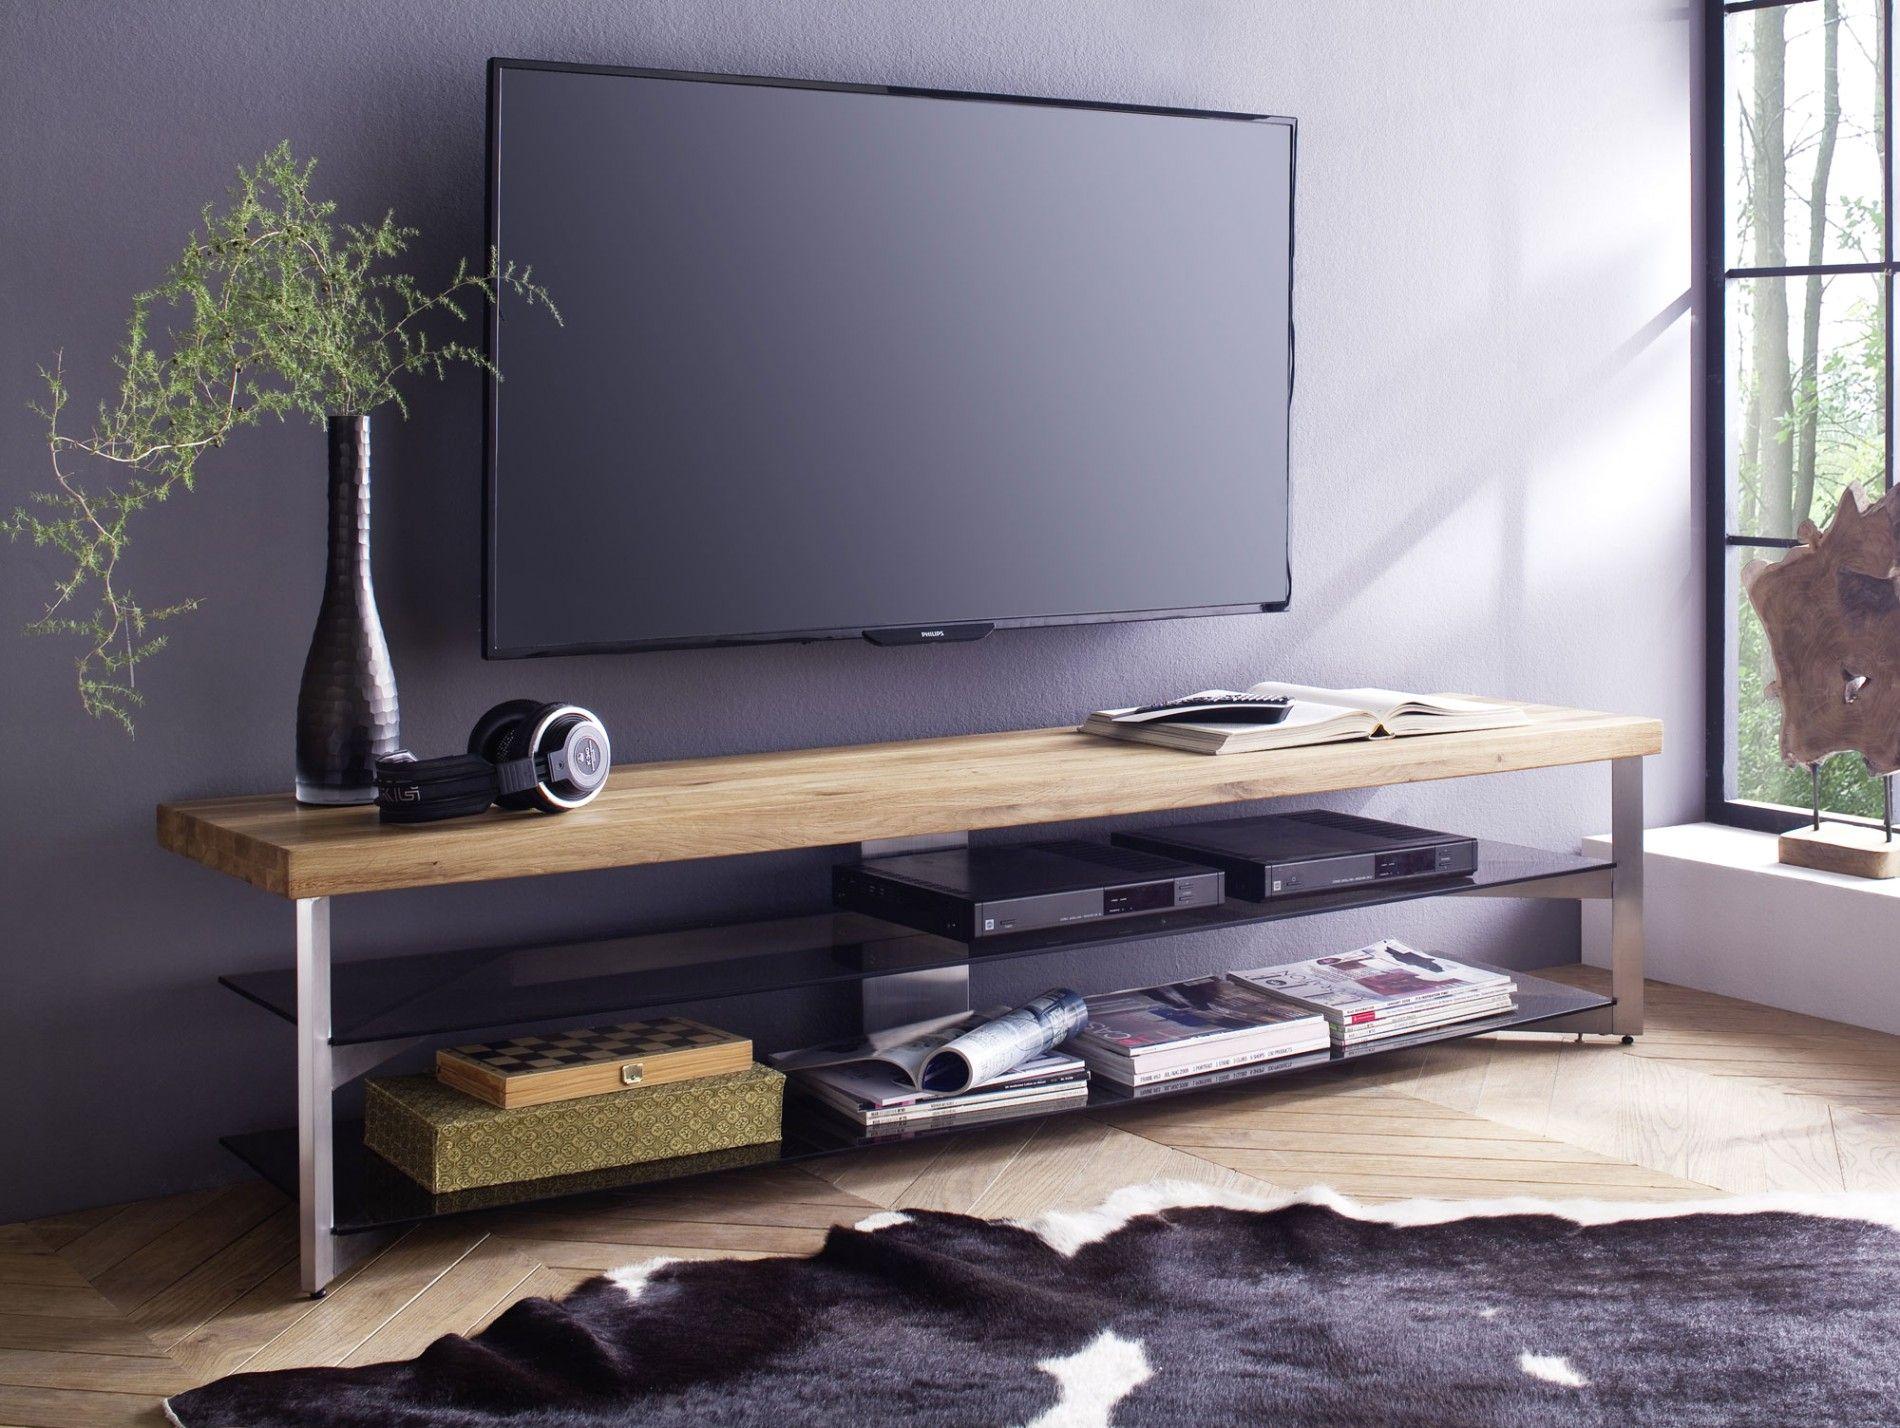 11 Cool Fotos Von Lowboard Hangend Grau Home Entertainment Furniture Rustic Tv Stand Tv Console Modern